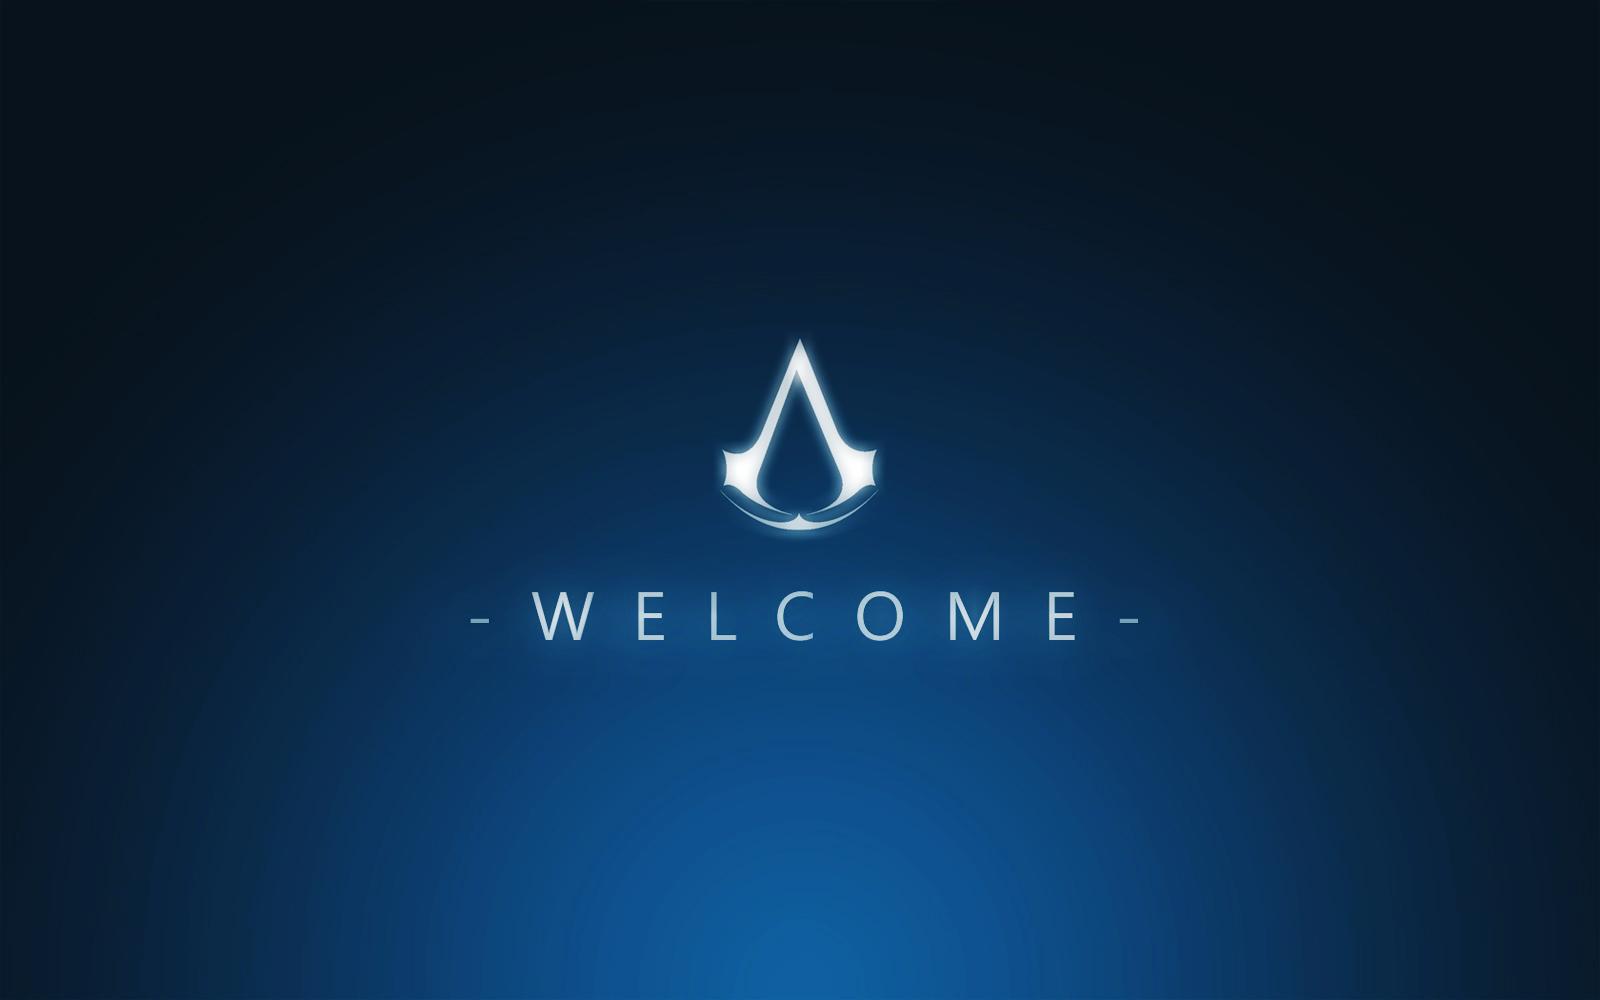 Assassins Creed Symbol Wallpaper Sf Wallpaper